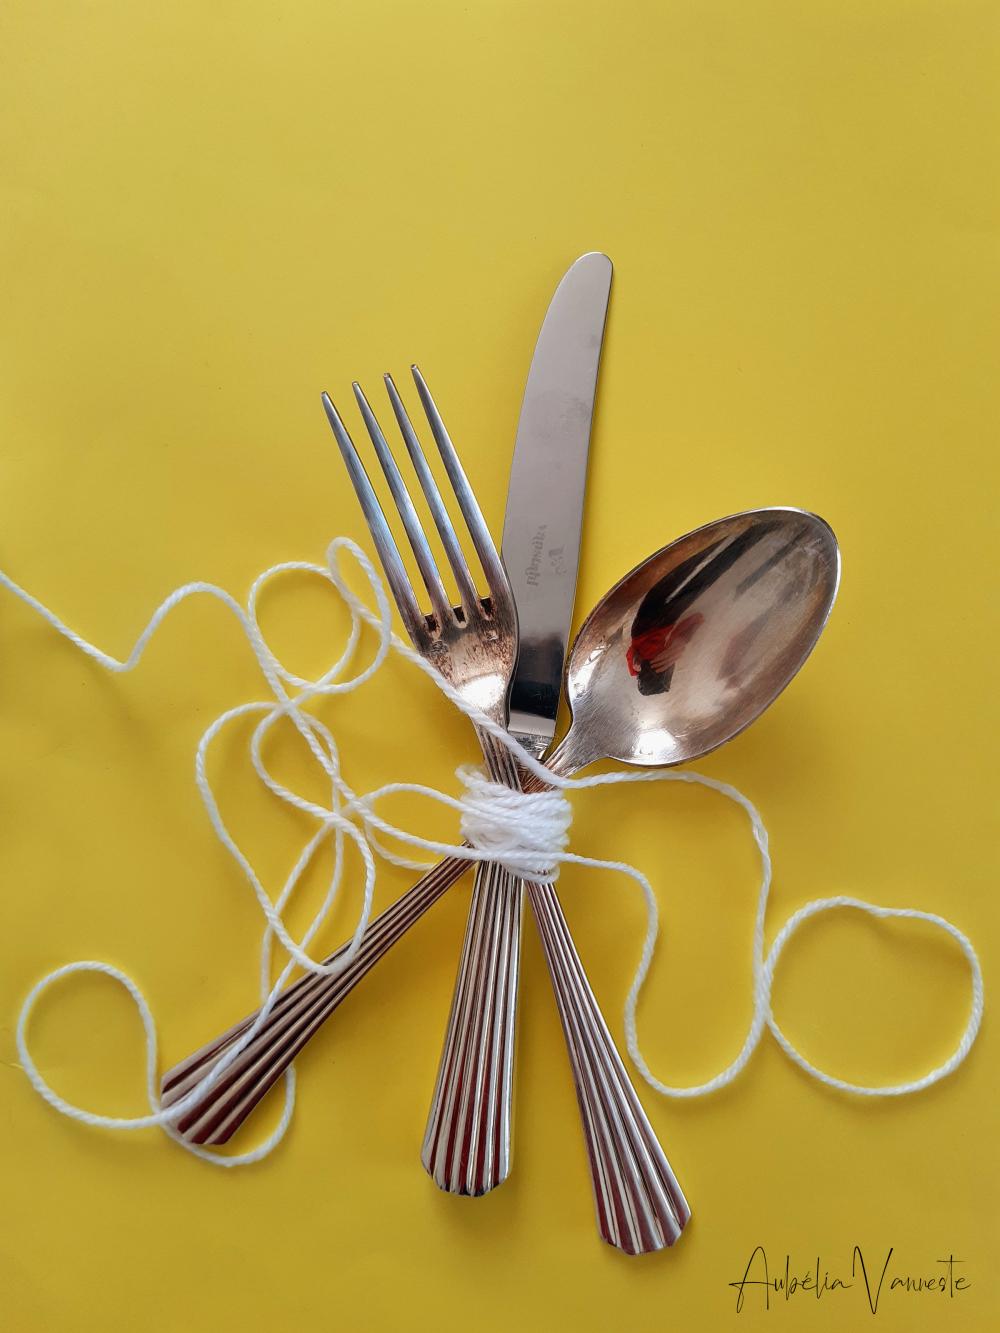 Nice cutlery